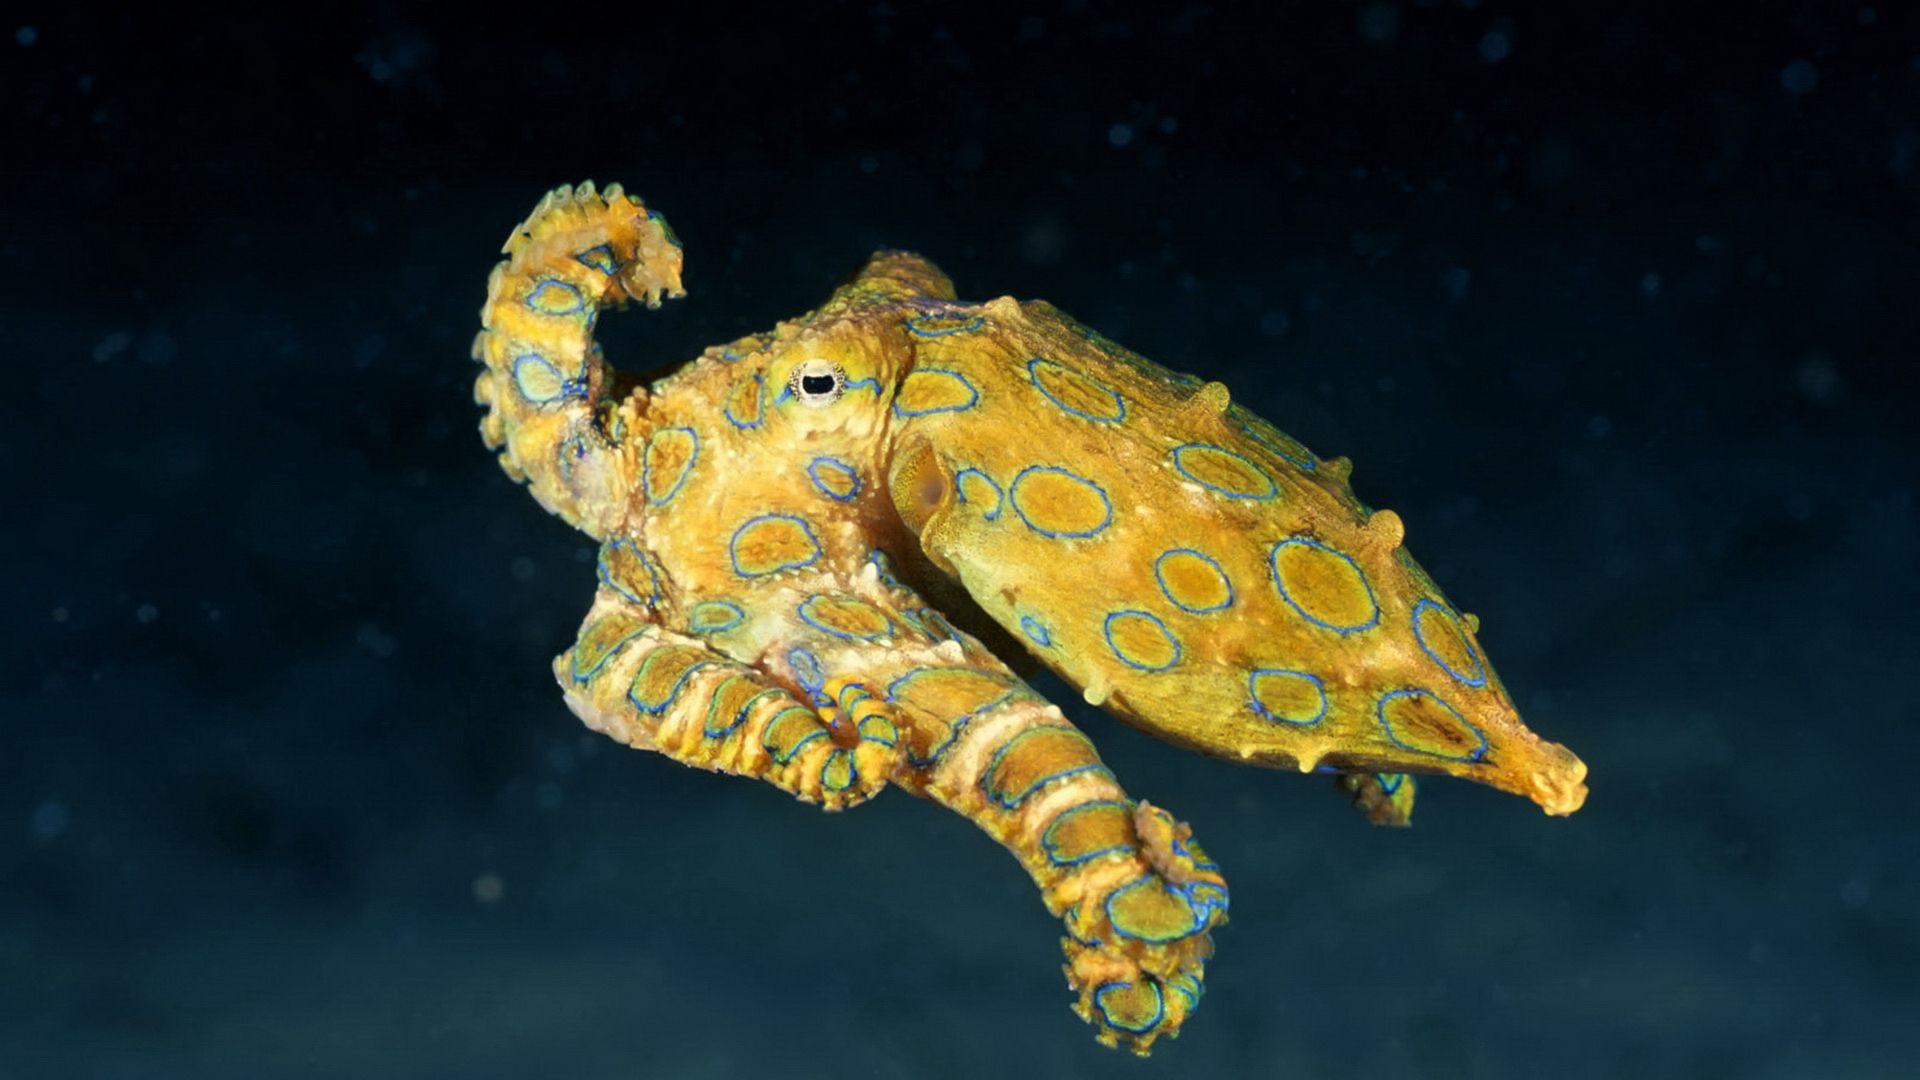 Sincerity Octopus Photo